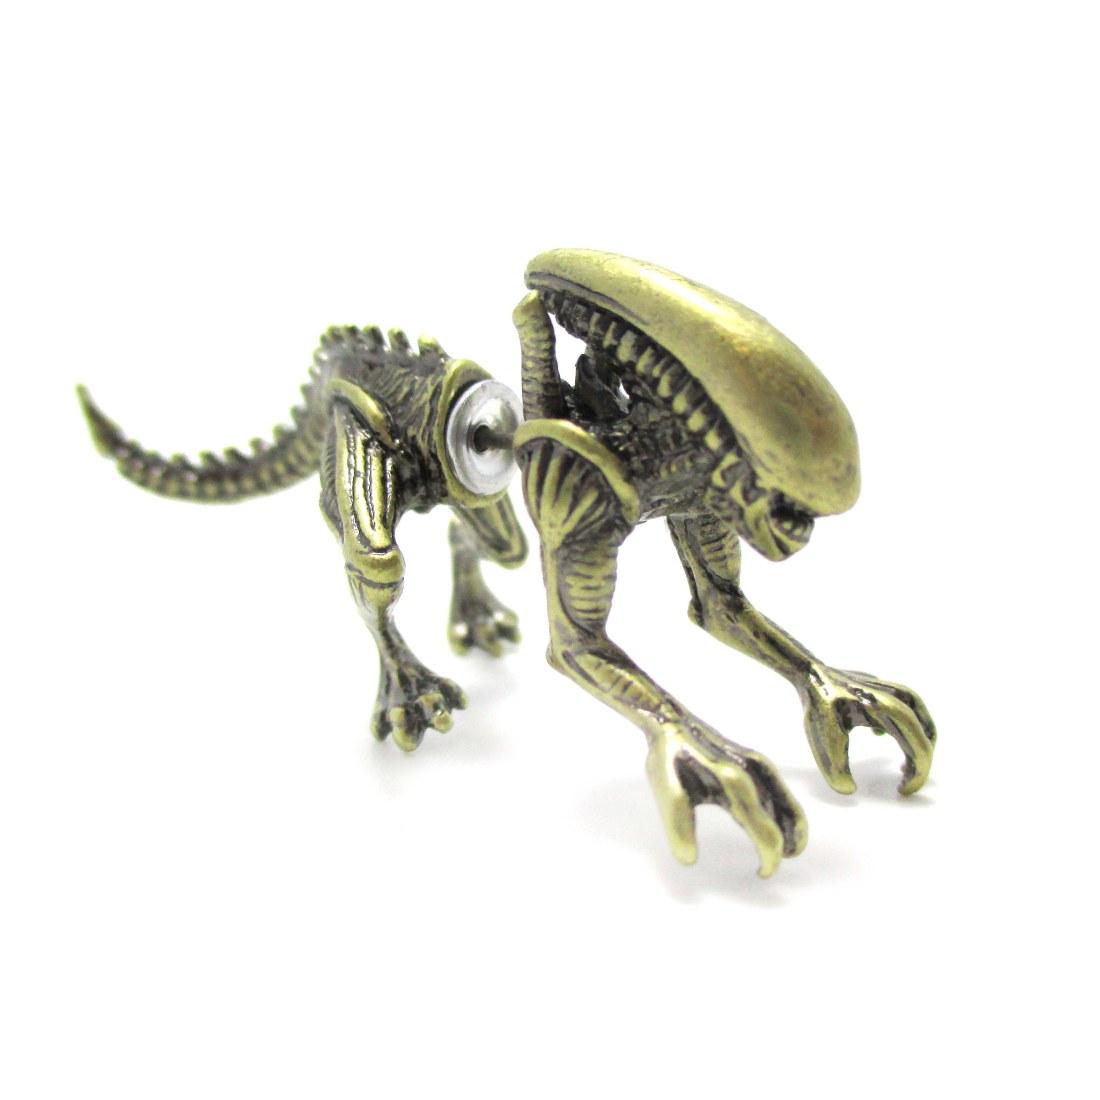 Predator Avp Xenomorph Shaped Front And Back Stud Earrings In Brass